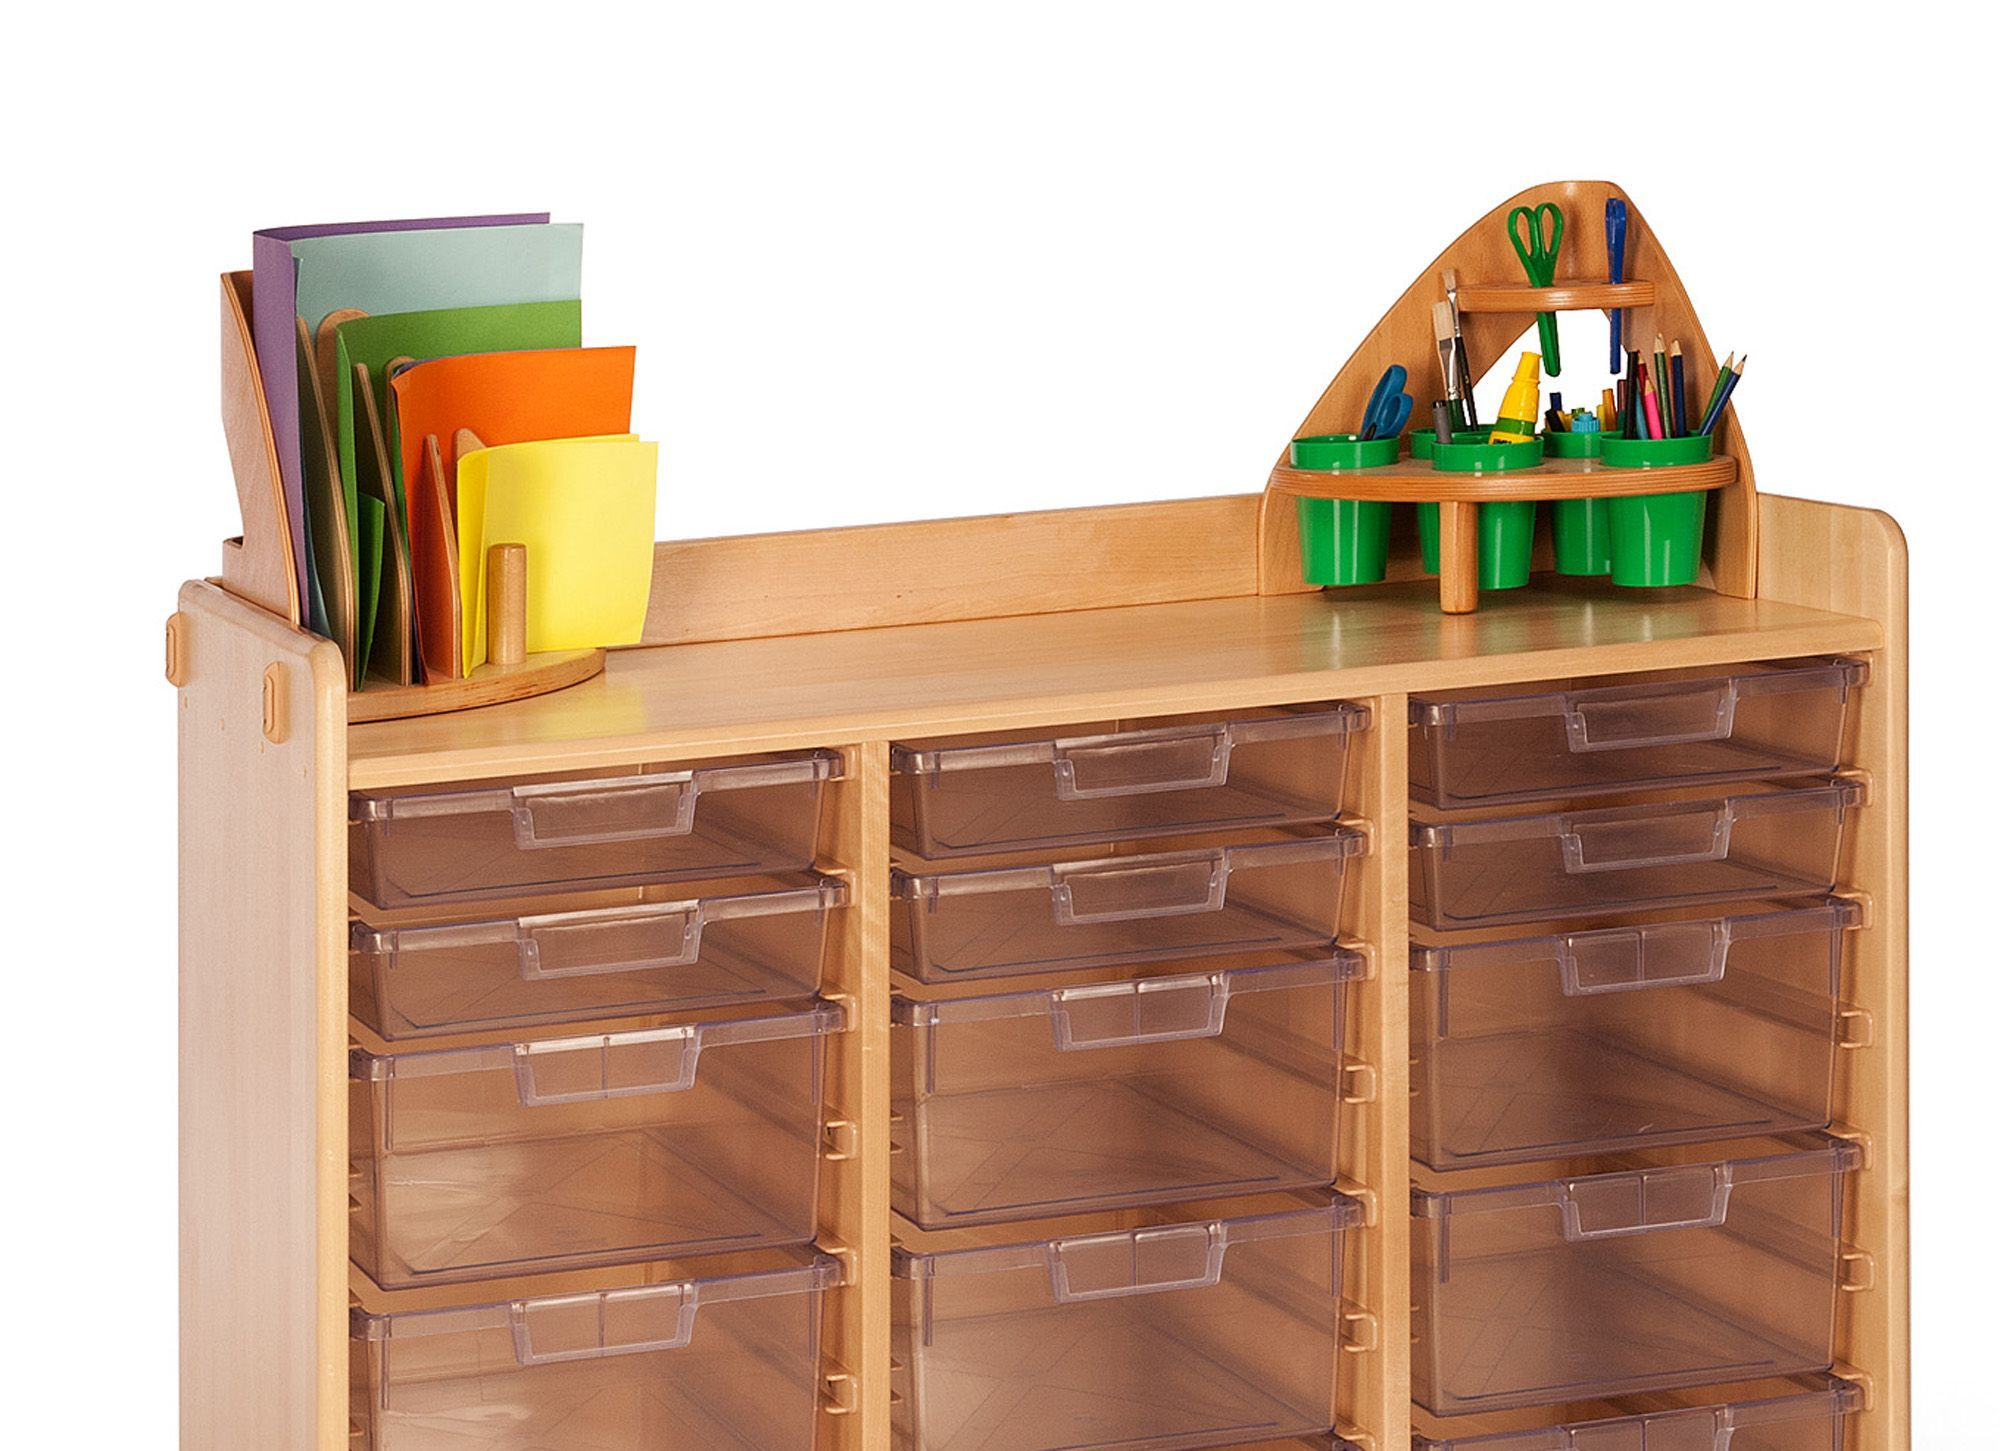 Community playthings tray shelving roomdividerideasentrance